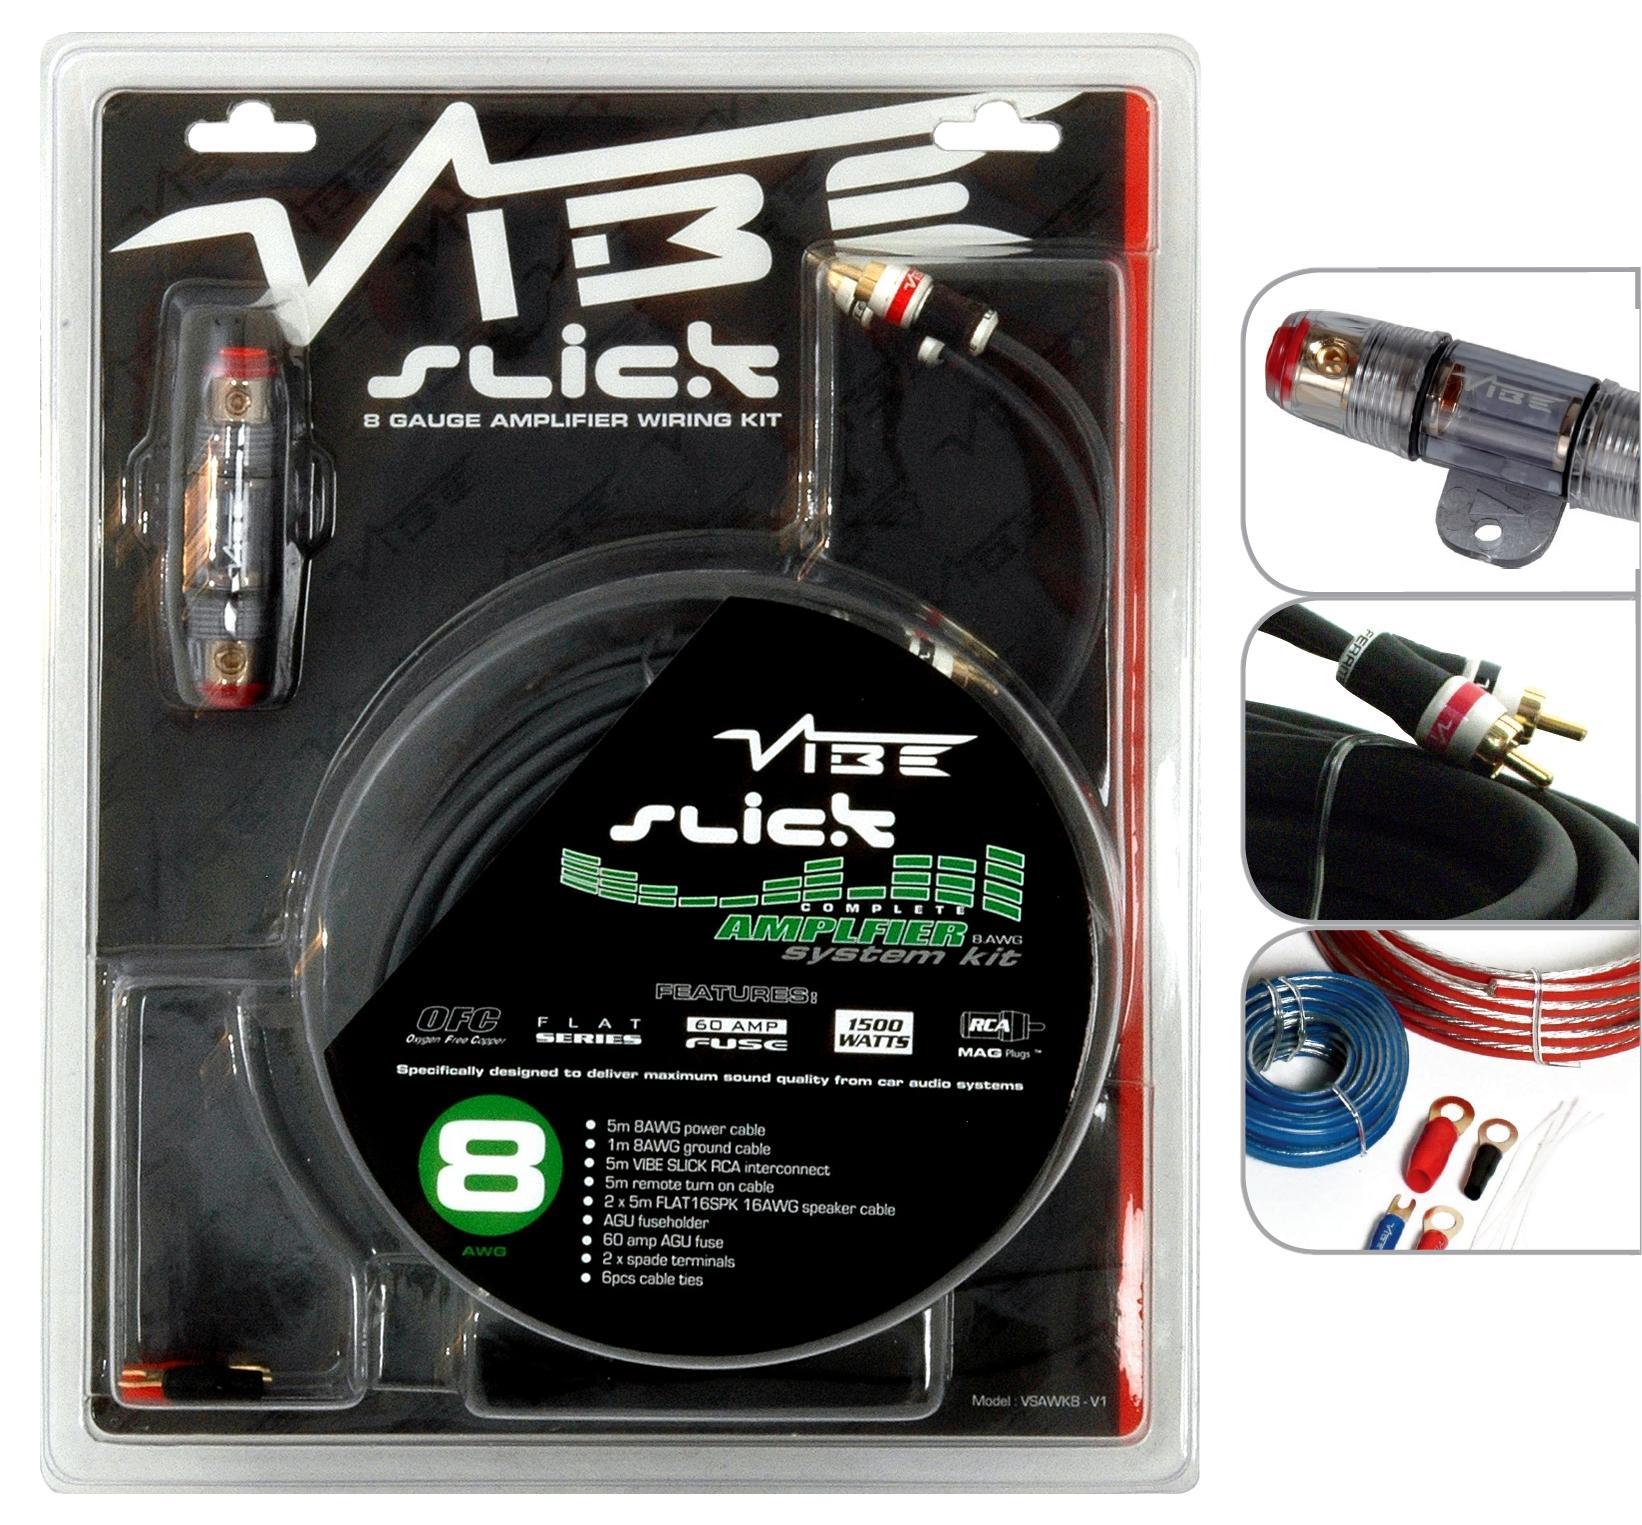 vibe slick 8 gauge amplifier wiring rh halfords com